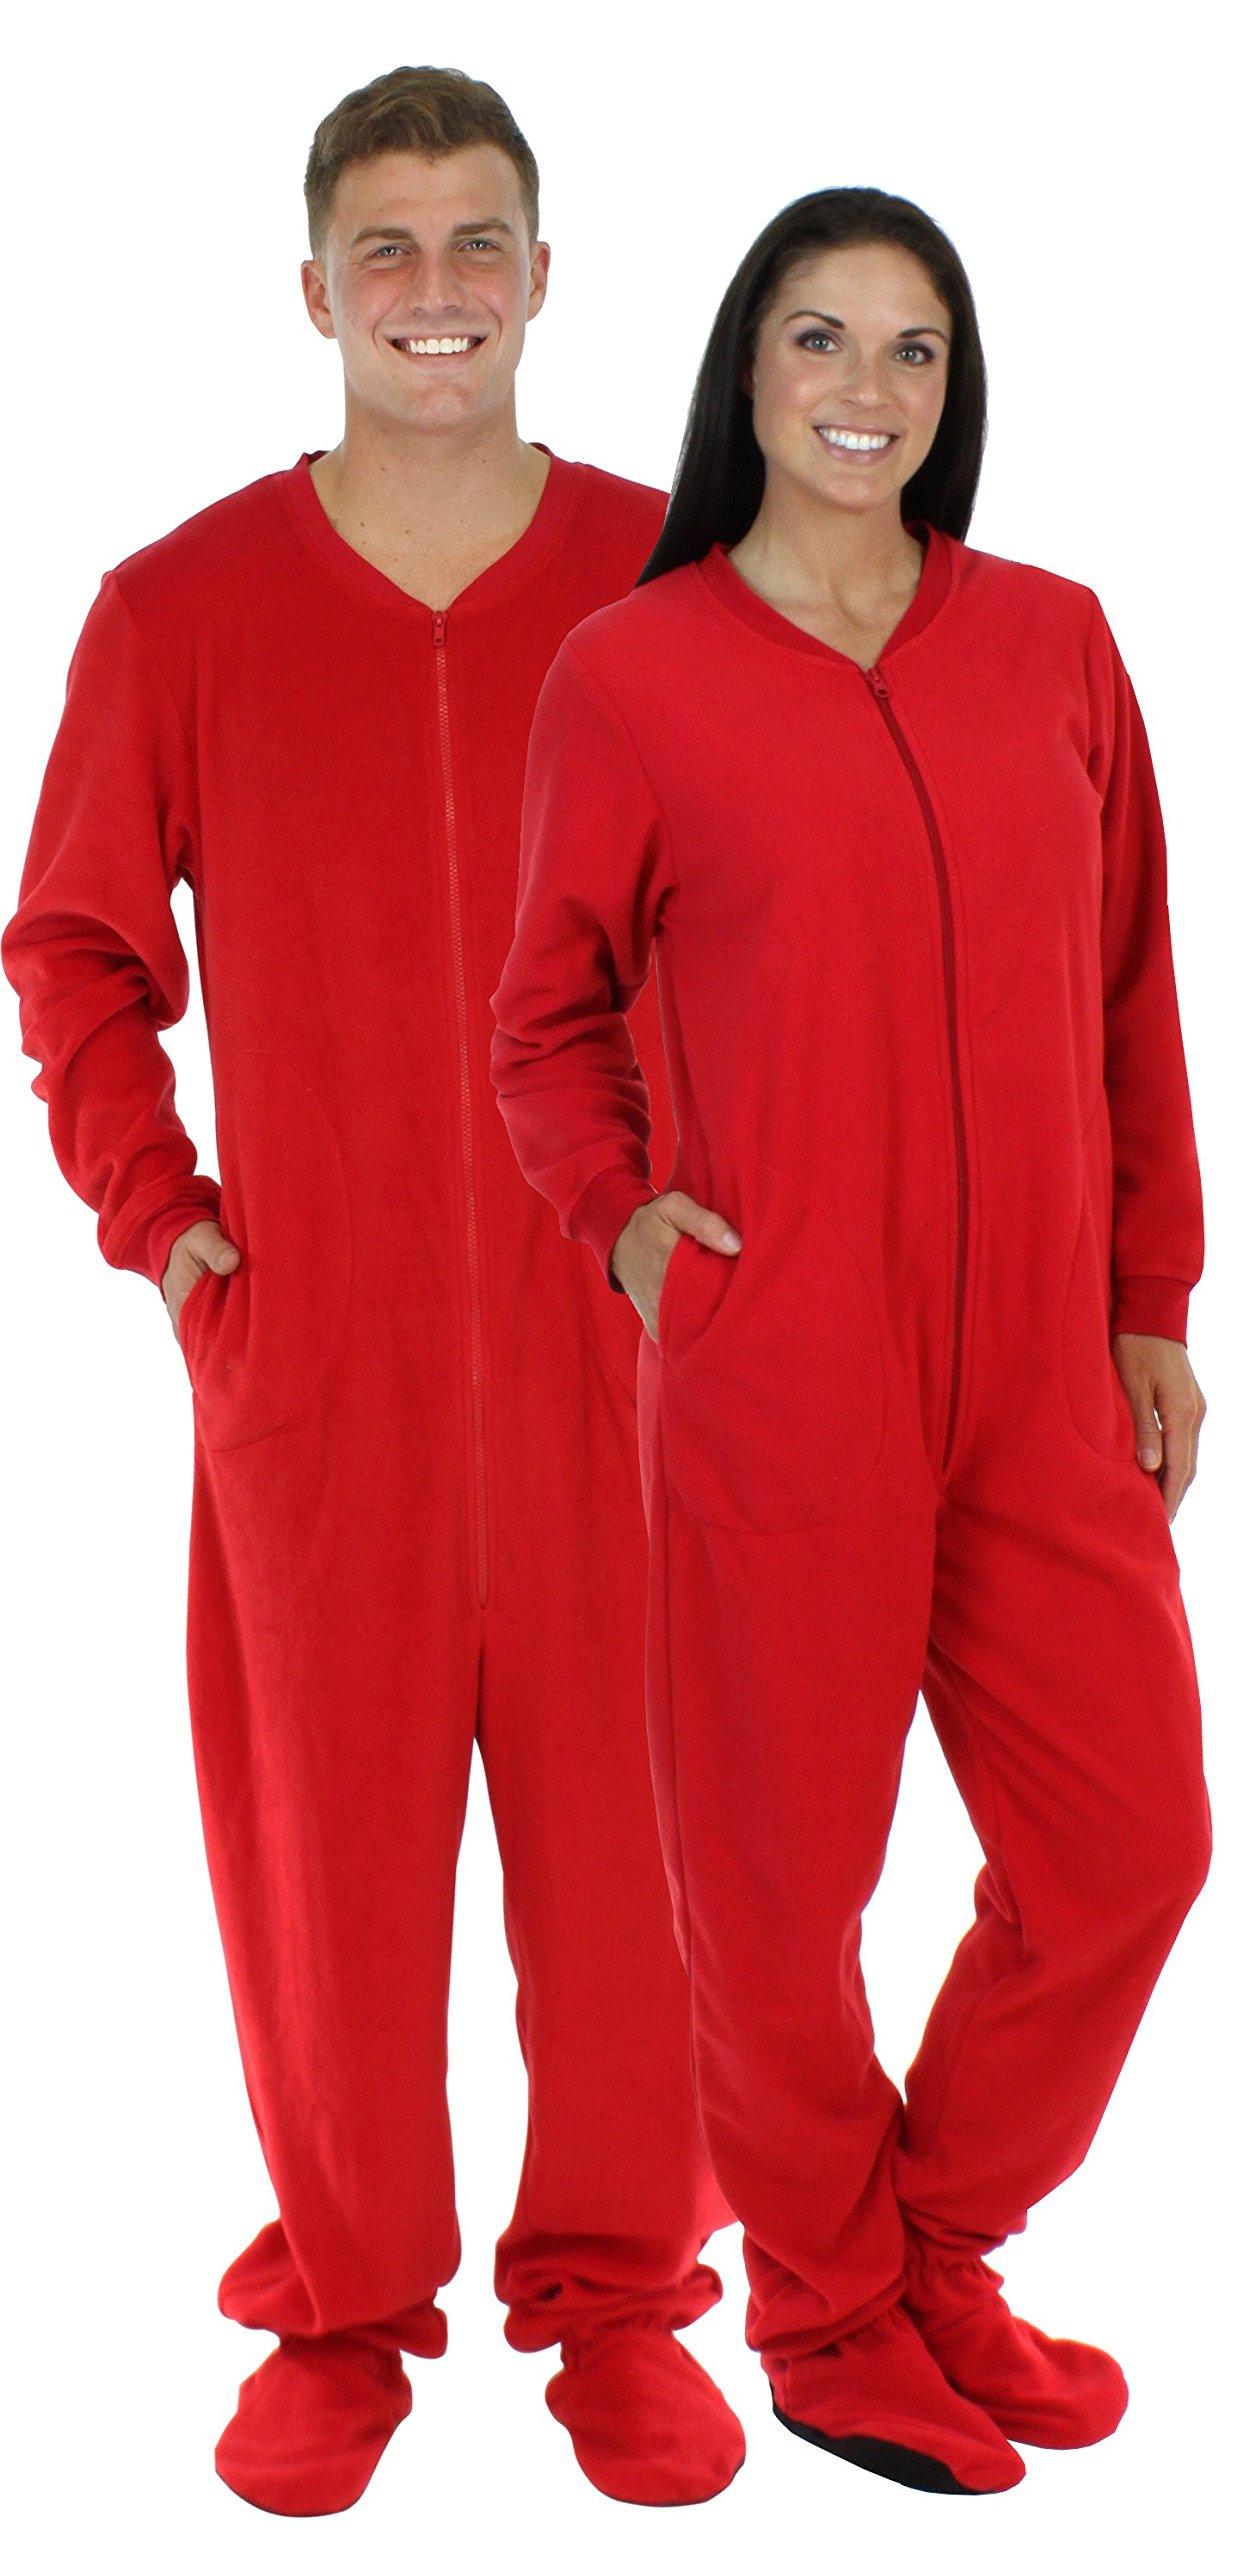 SleepytimePjs Adult Red Fleece Onesie Pjs Footed Pajama-Women (ST17-W-RED-2X)